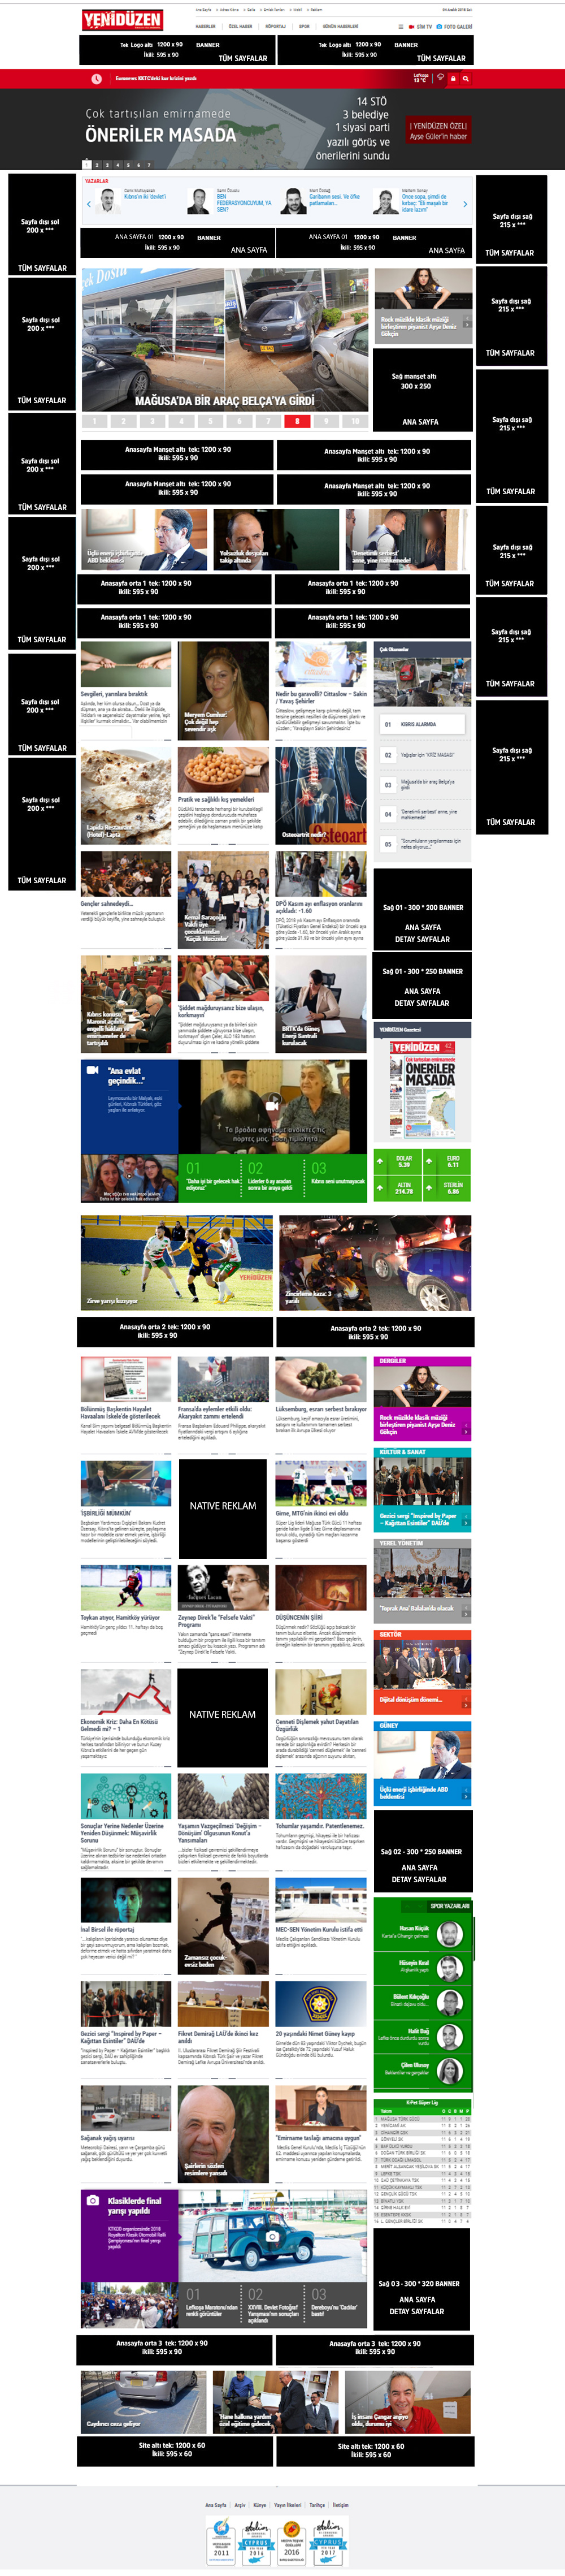 yd-ana-sayfa-reklam-alani.jpg